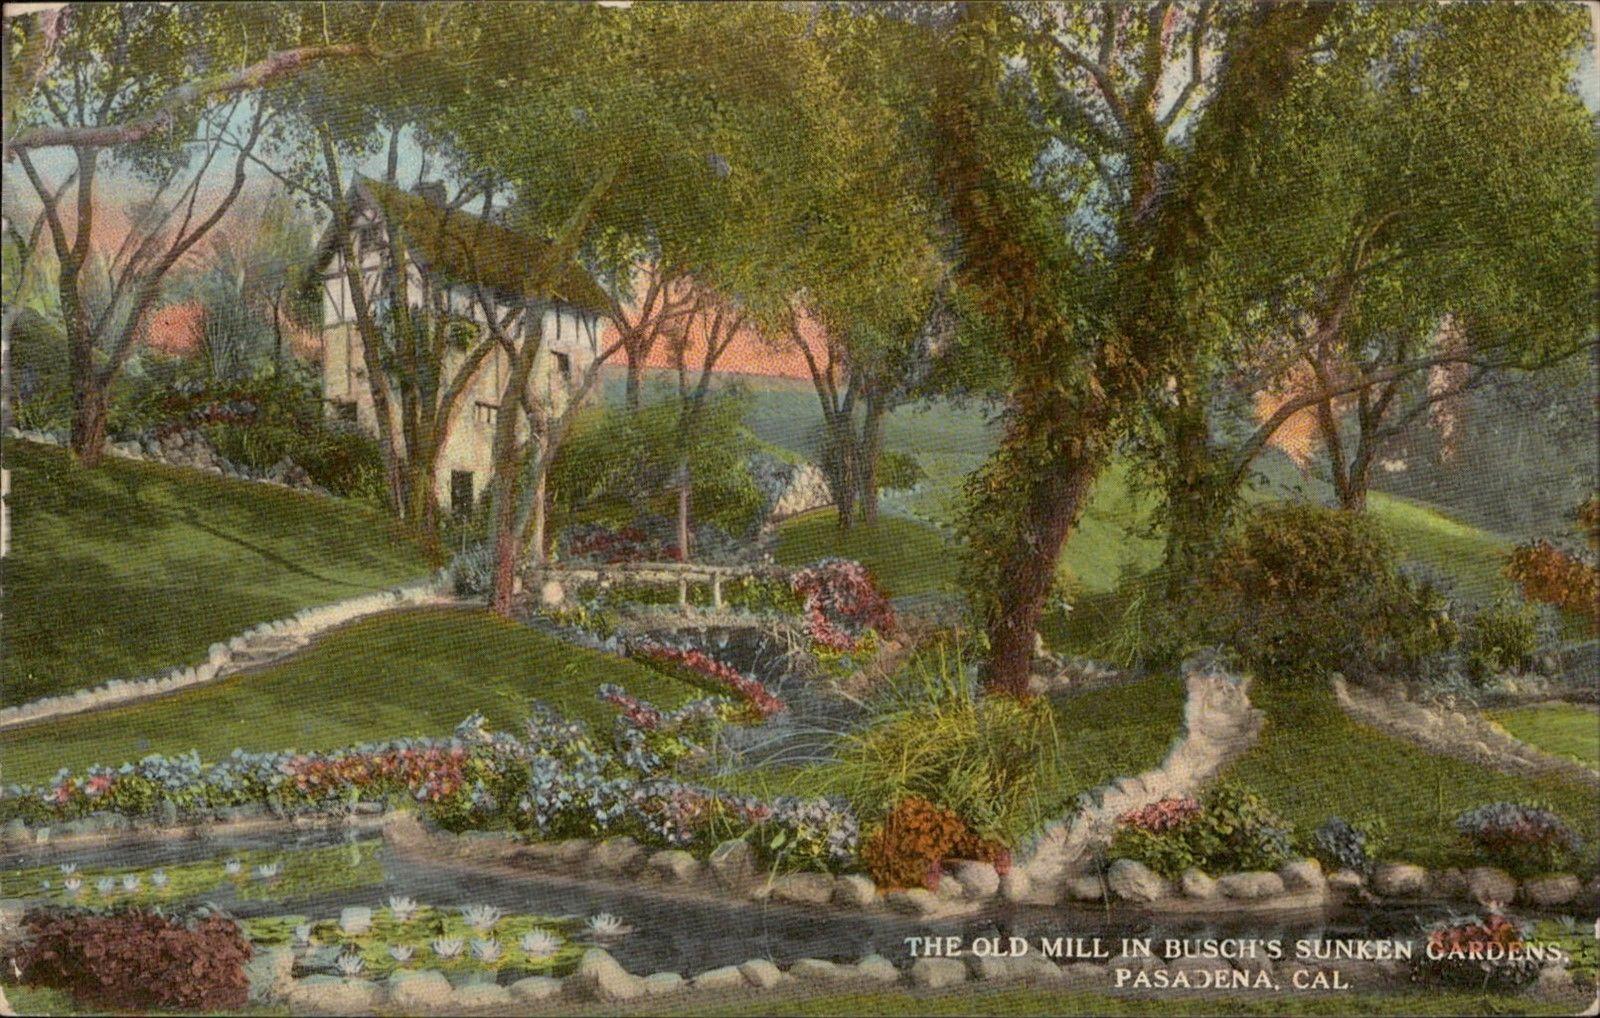 Old Mill Sunken Gardens Pasadena California / HipPostcard